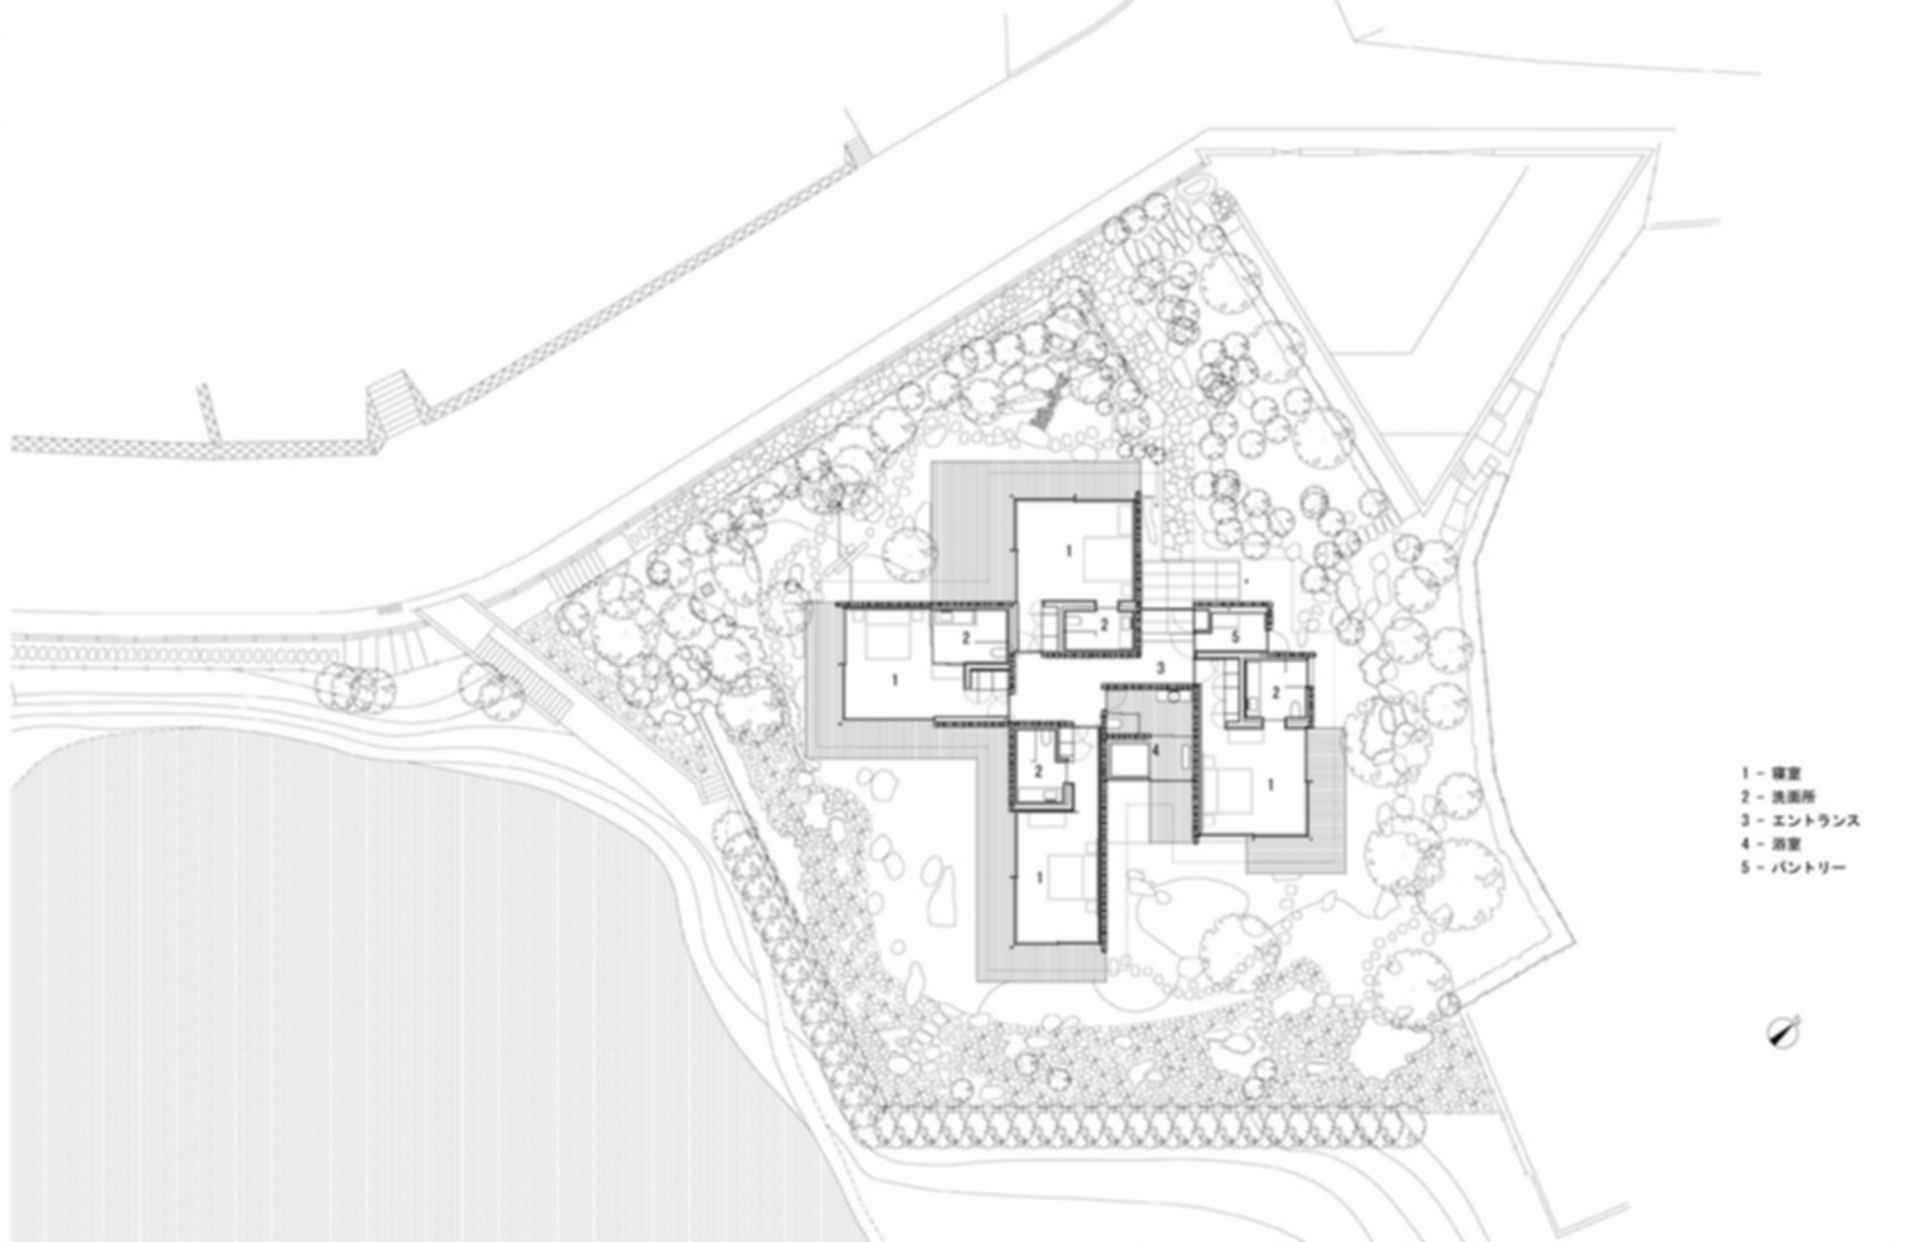 PC House - Site Plan